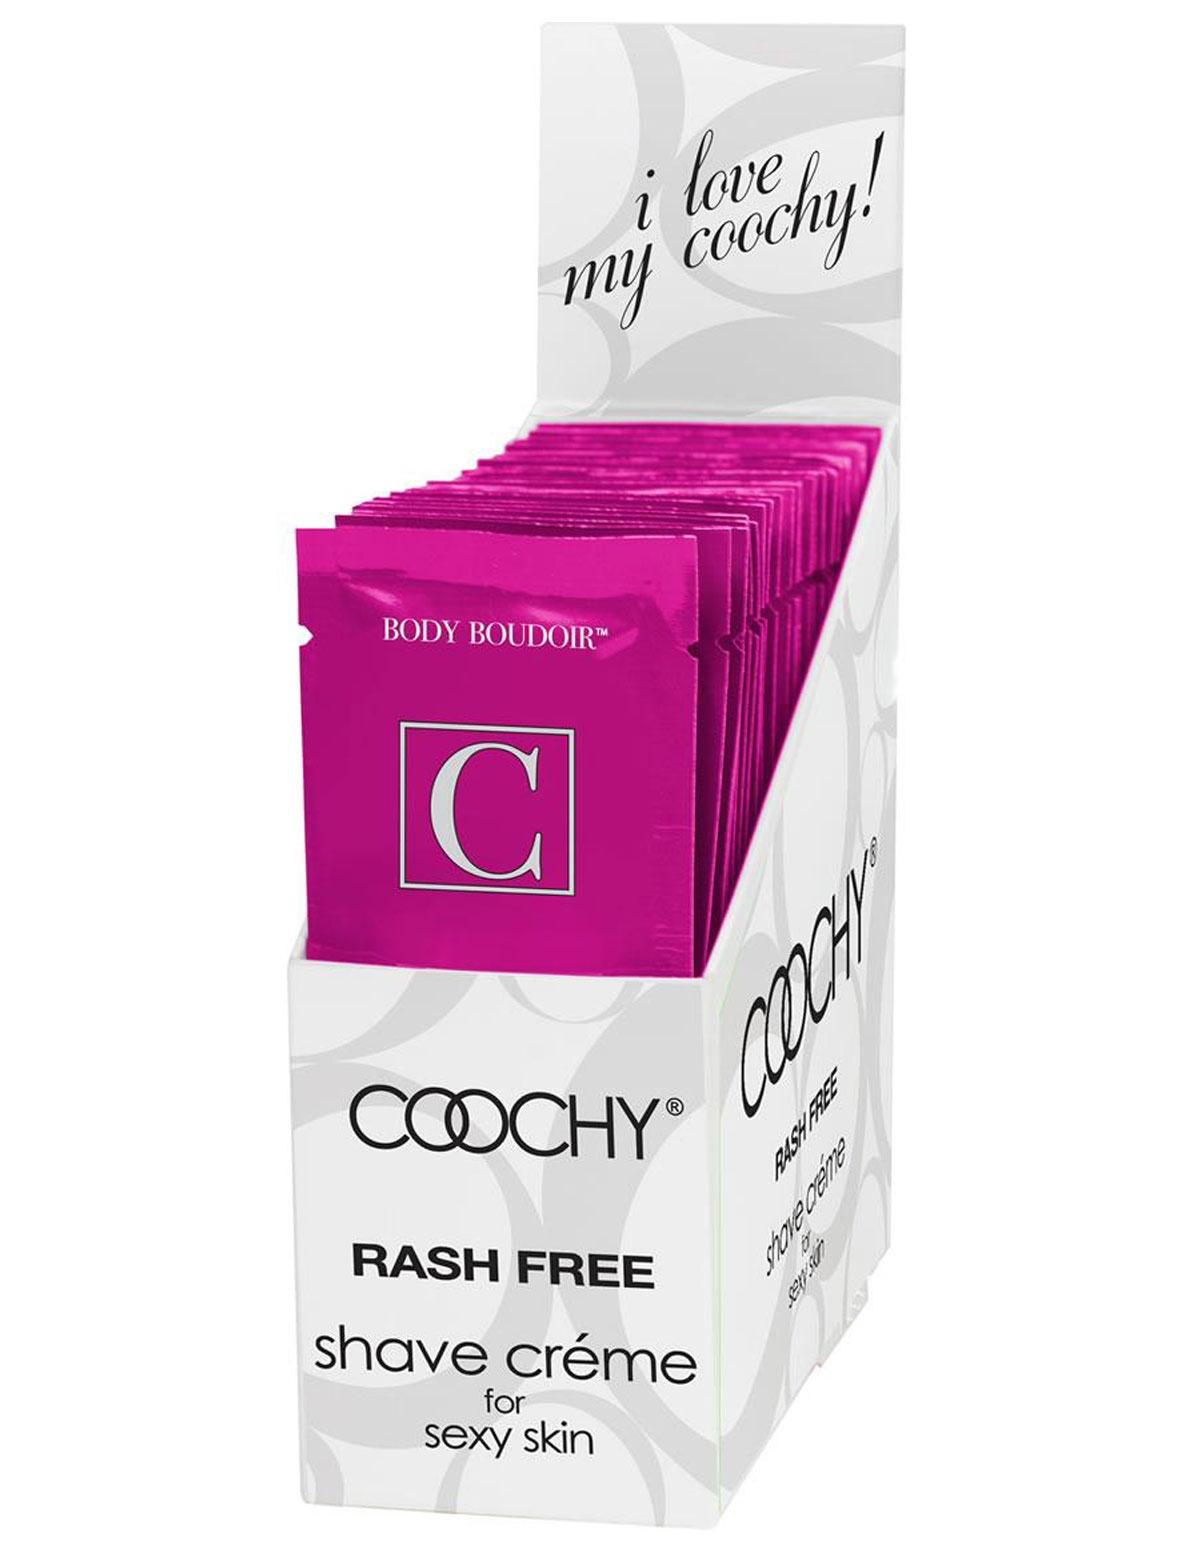 Coochy Pear Berry .5 Oz Shaving Cream